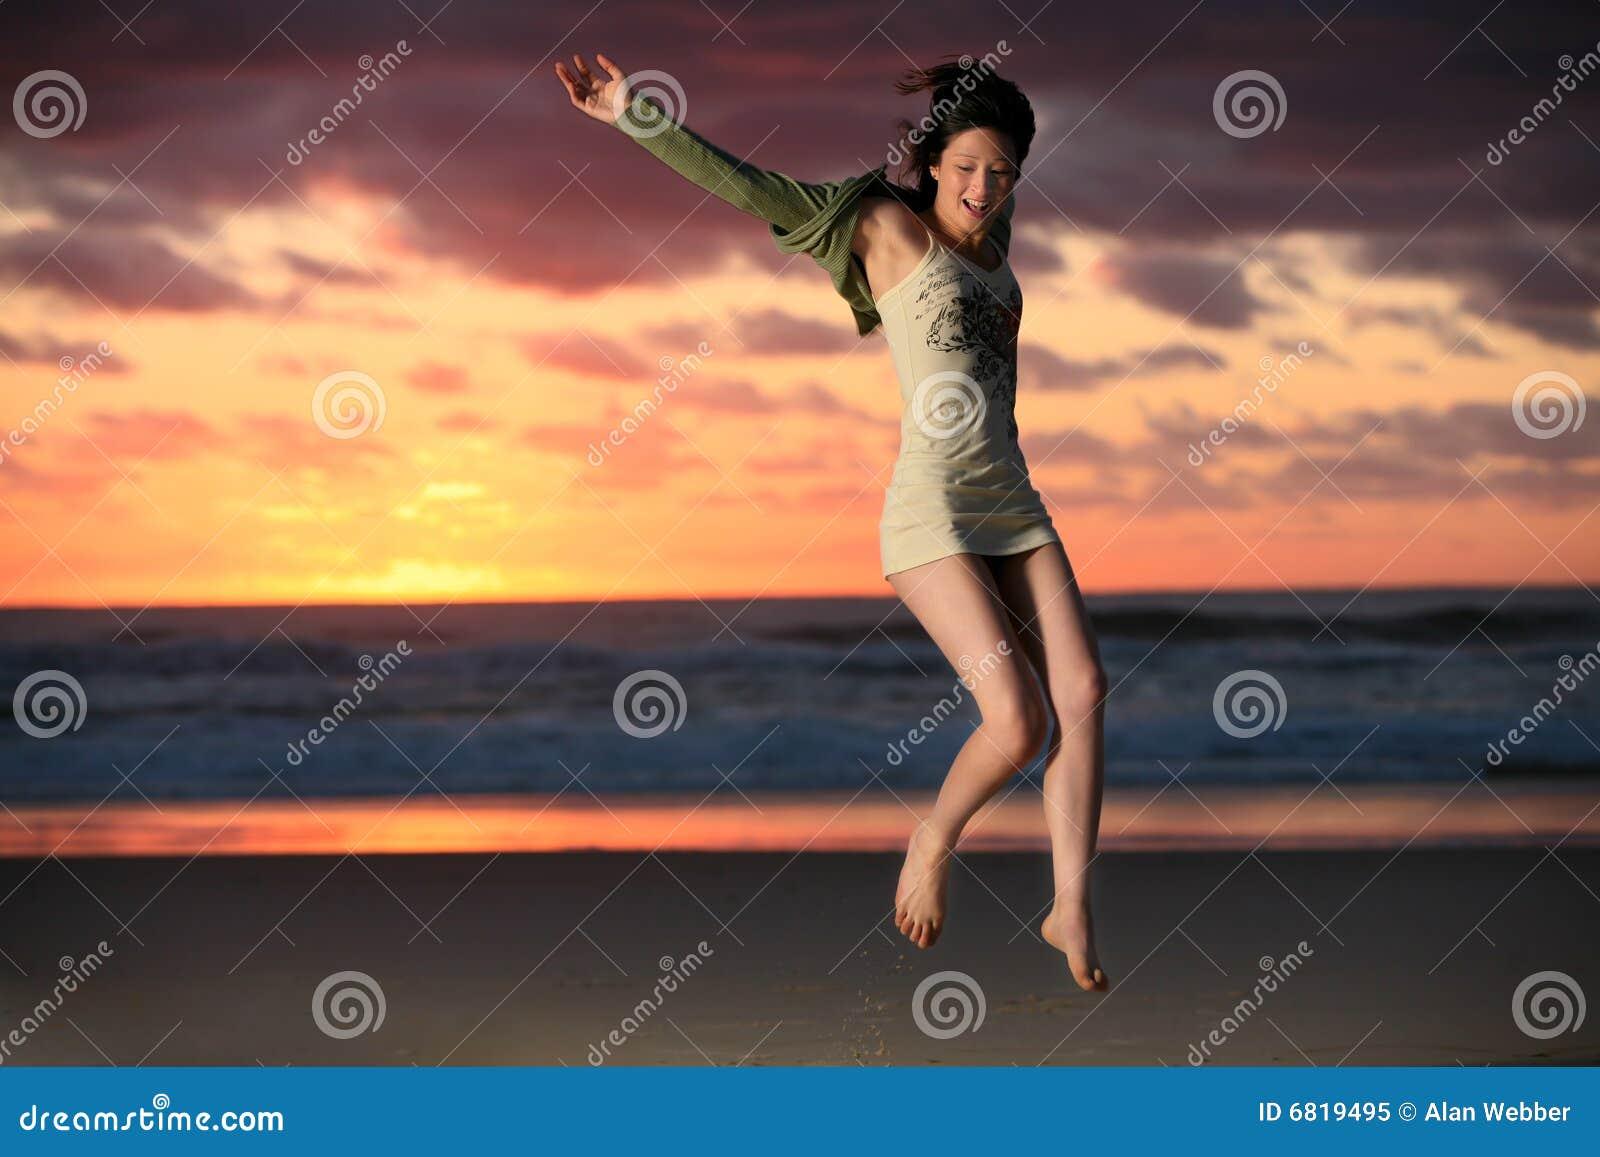 jump for joy royalty free stock photo image 6819495